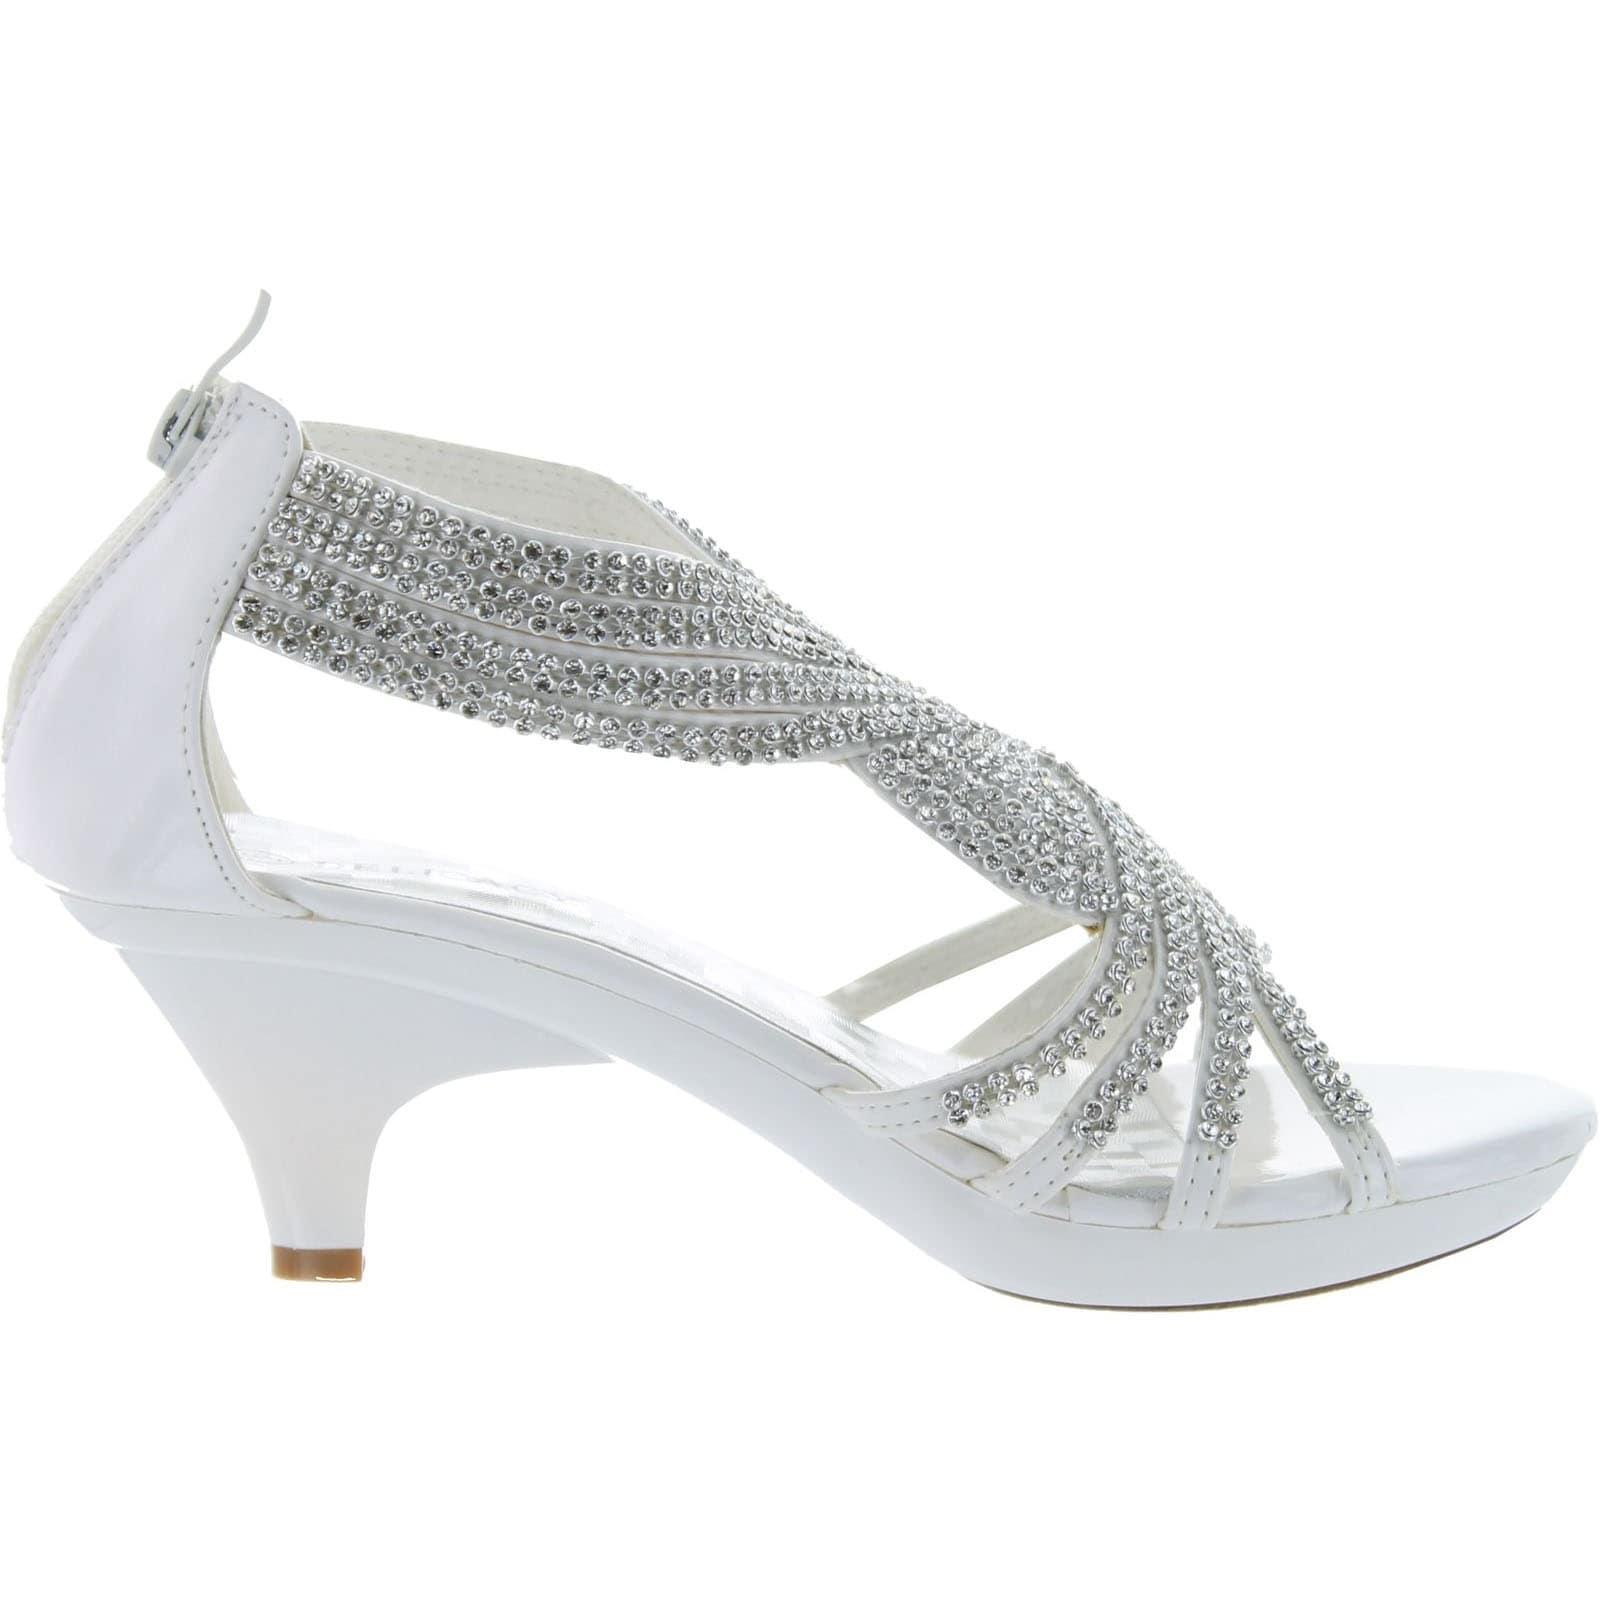 Delicacy Womens Angel-37 Strappy Rhinestone Dress Sandal Low Heel ...